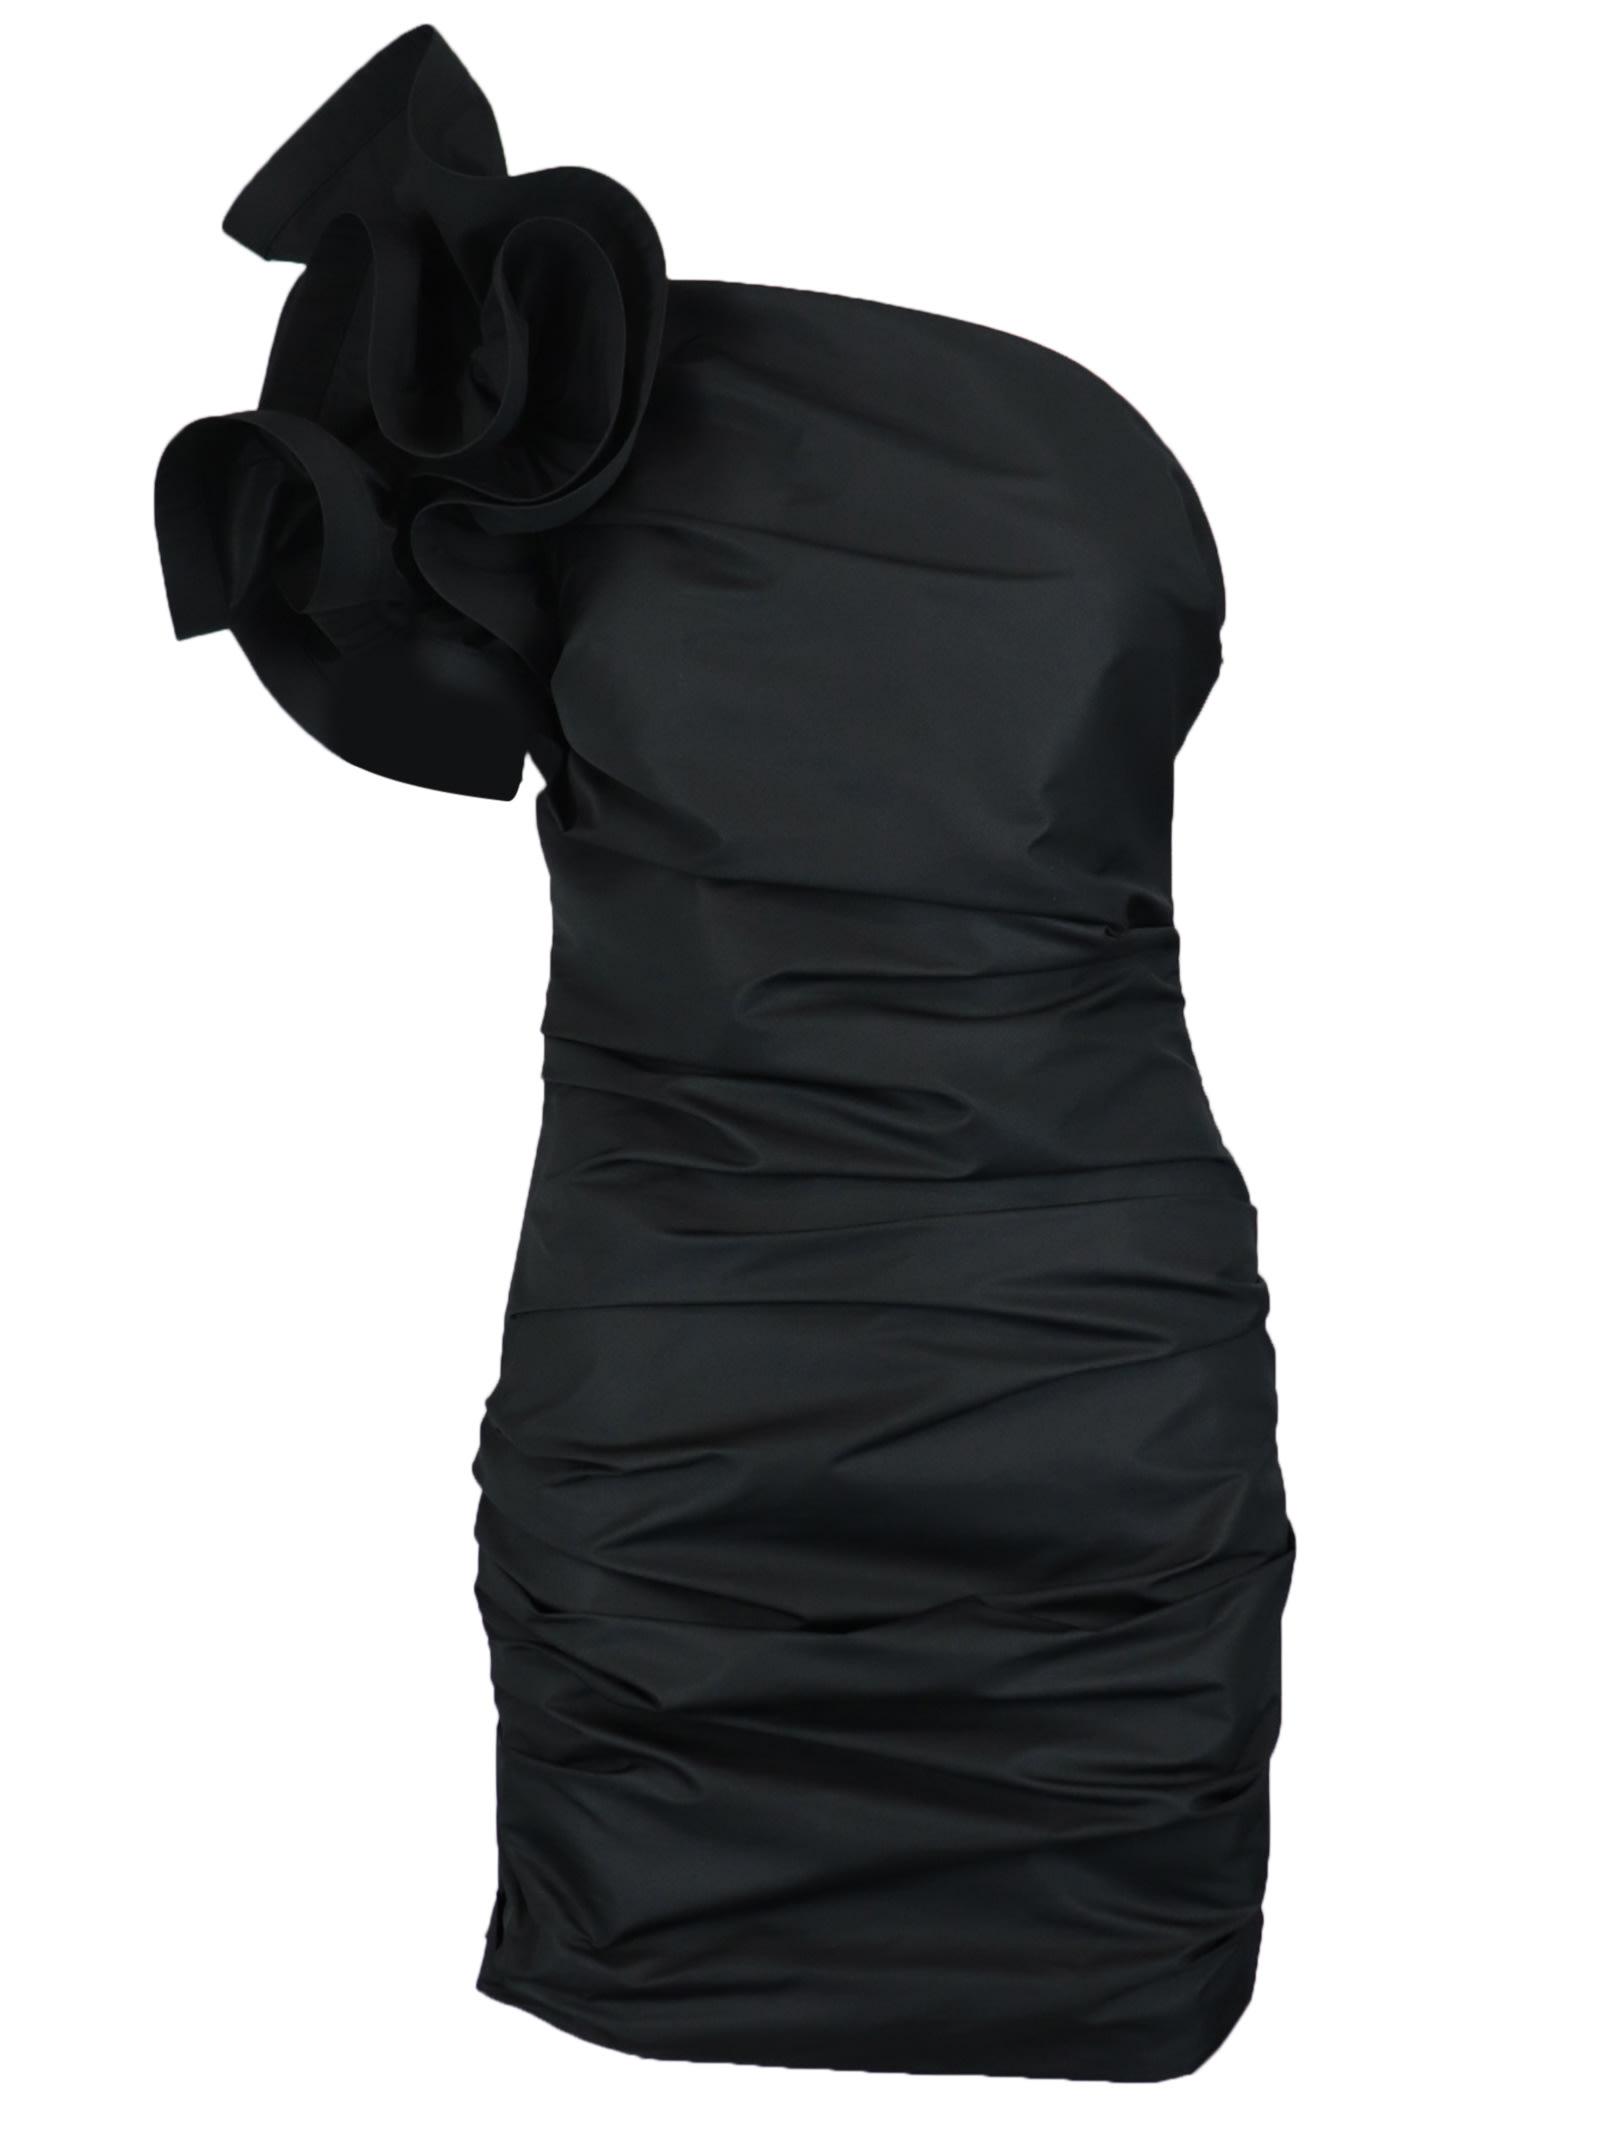 Buy Elisabetta Franchi Celyn B. Sculpture Dress online, shop Elisabetta Franchi Celyn B. with free shipping